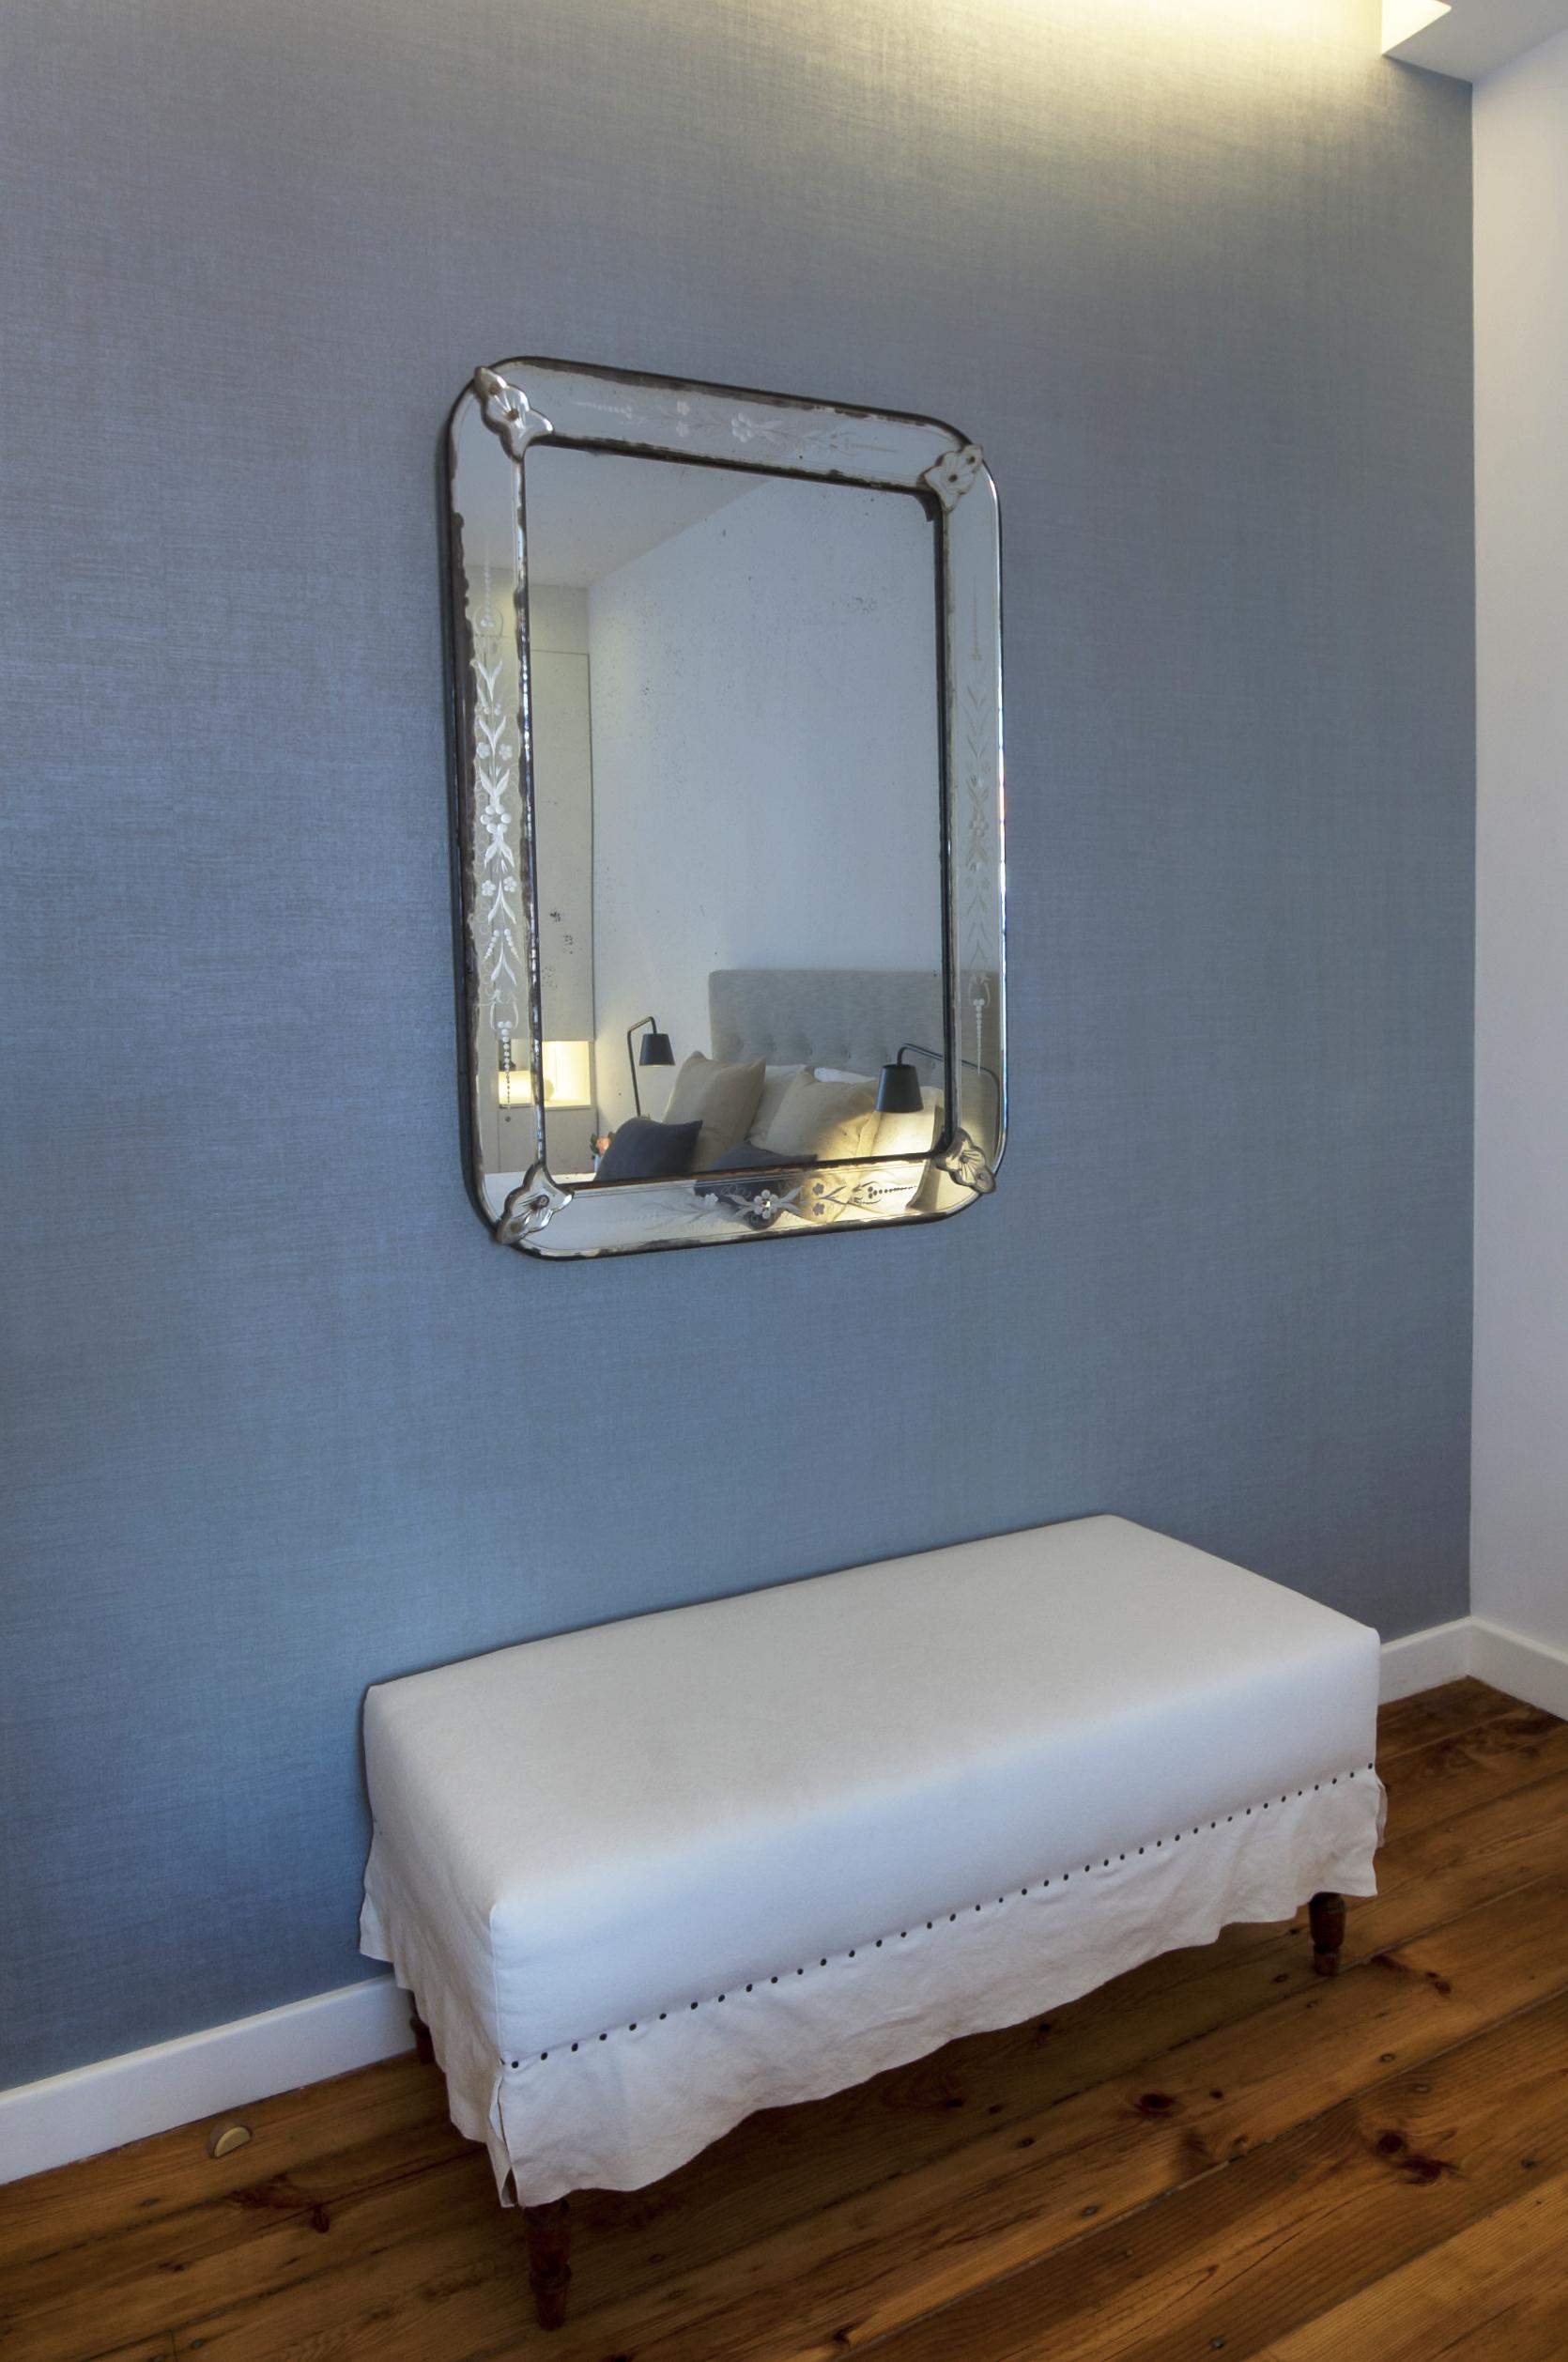 13 Bedroom 1 detail an original antique Venetian mirror.jpg